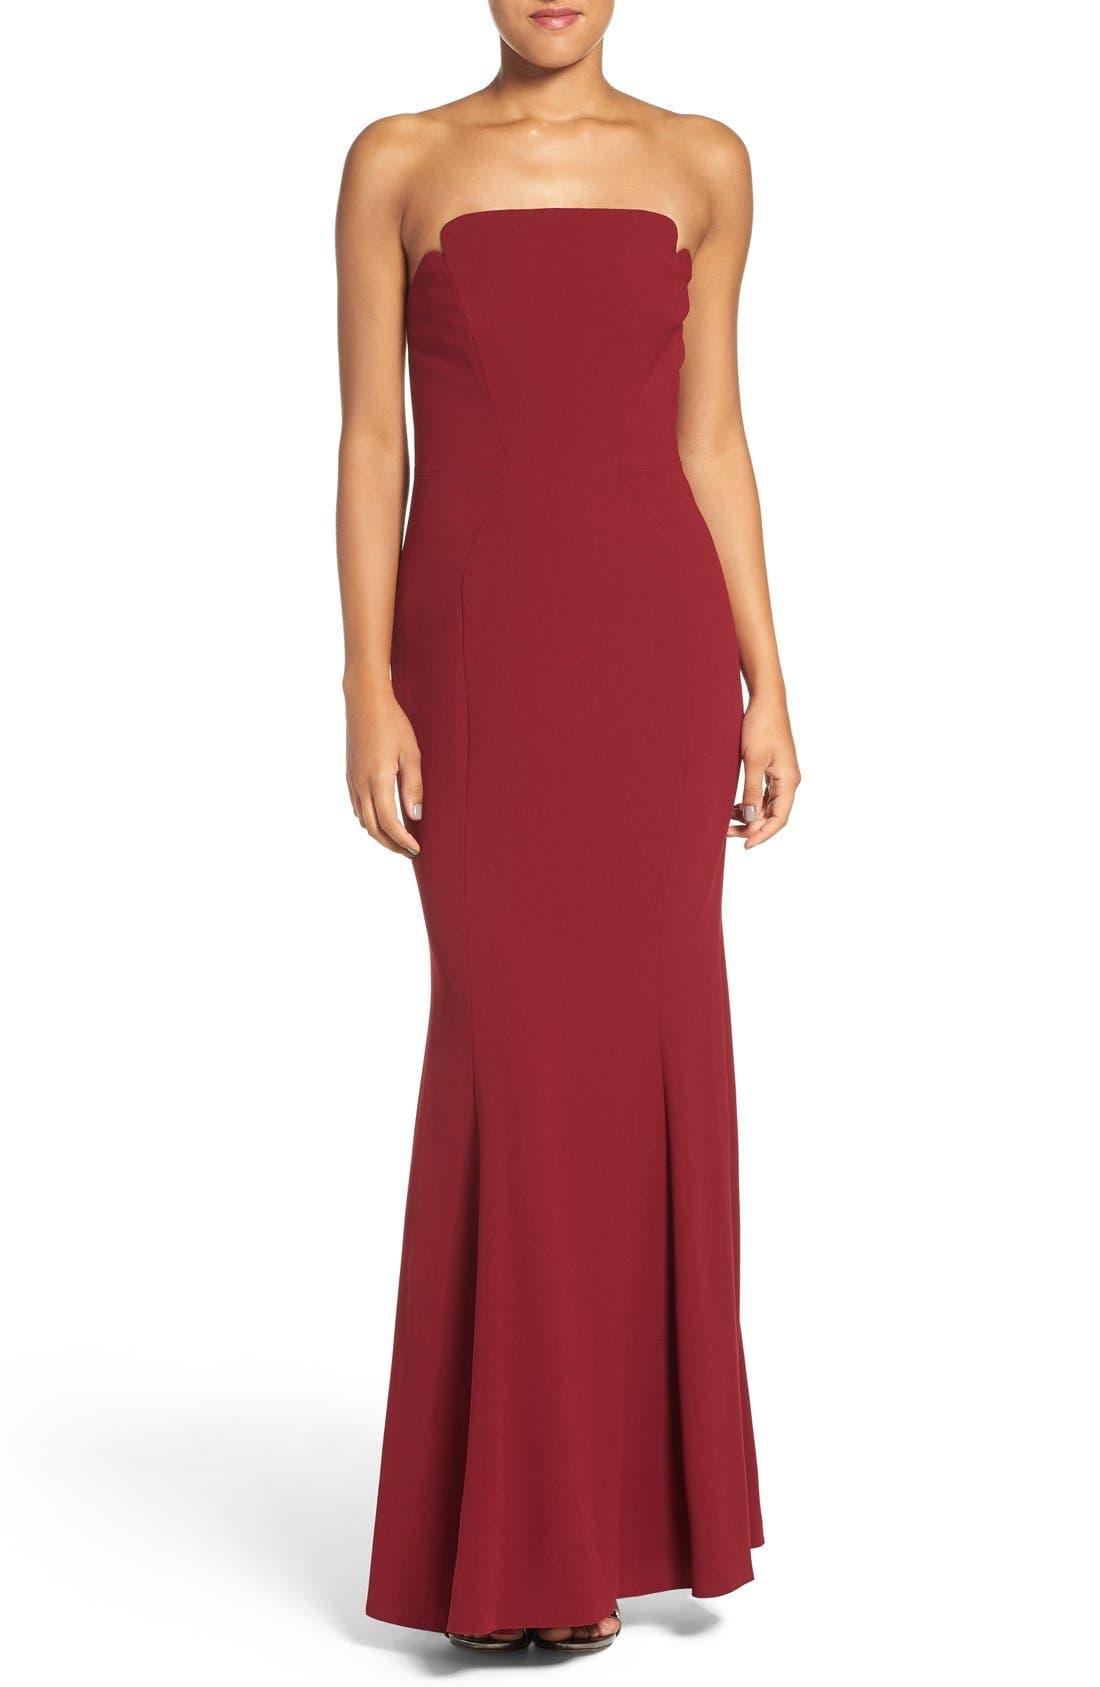 Alternate Image 1 Selected - Jill Jill Stuart Notched Strapless Gown